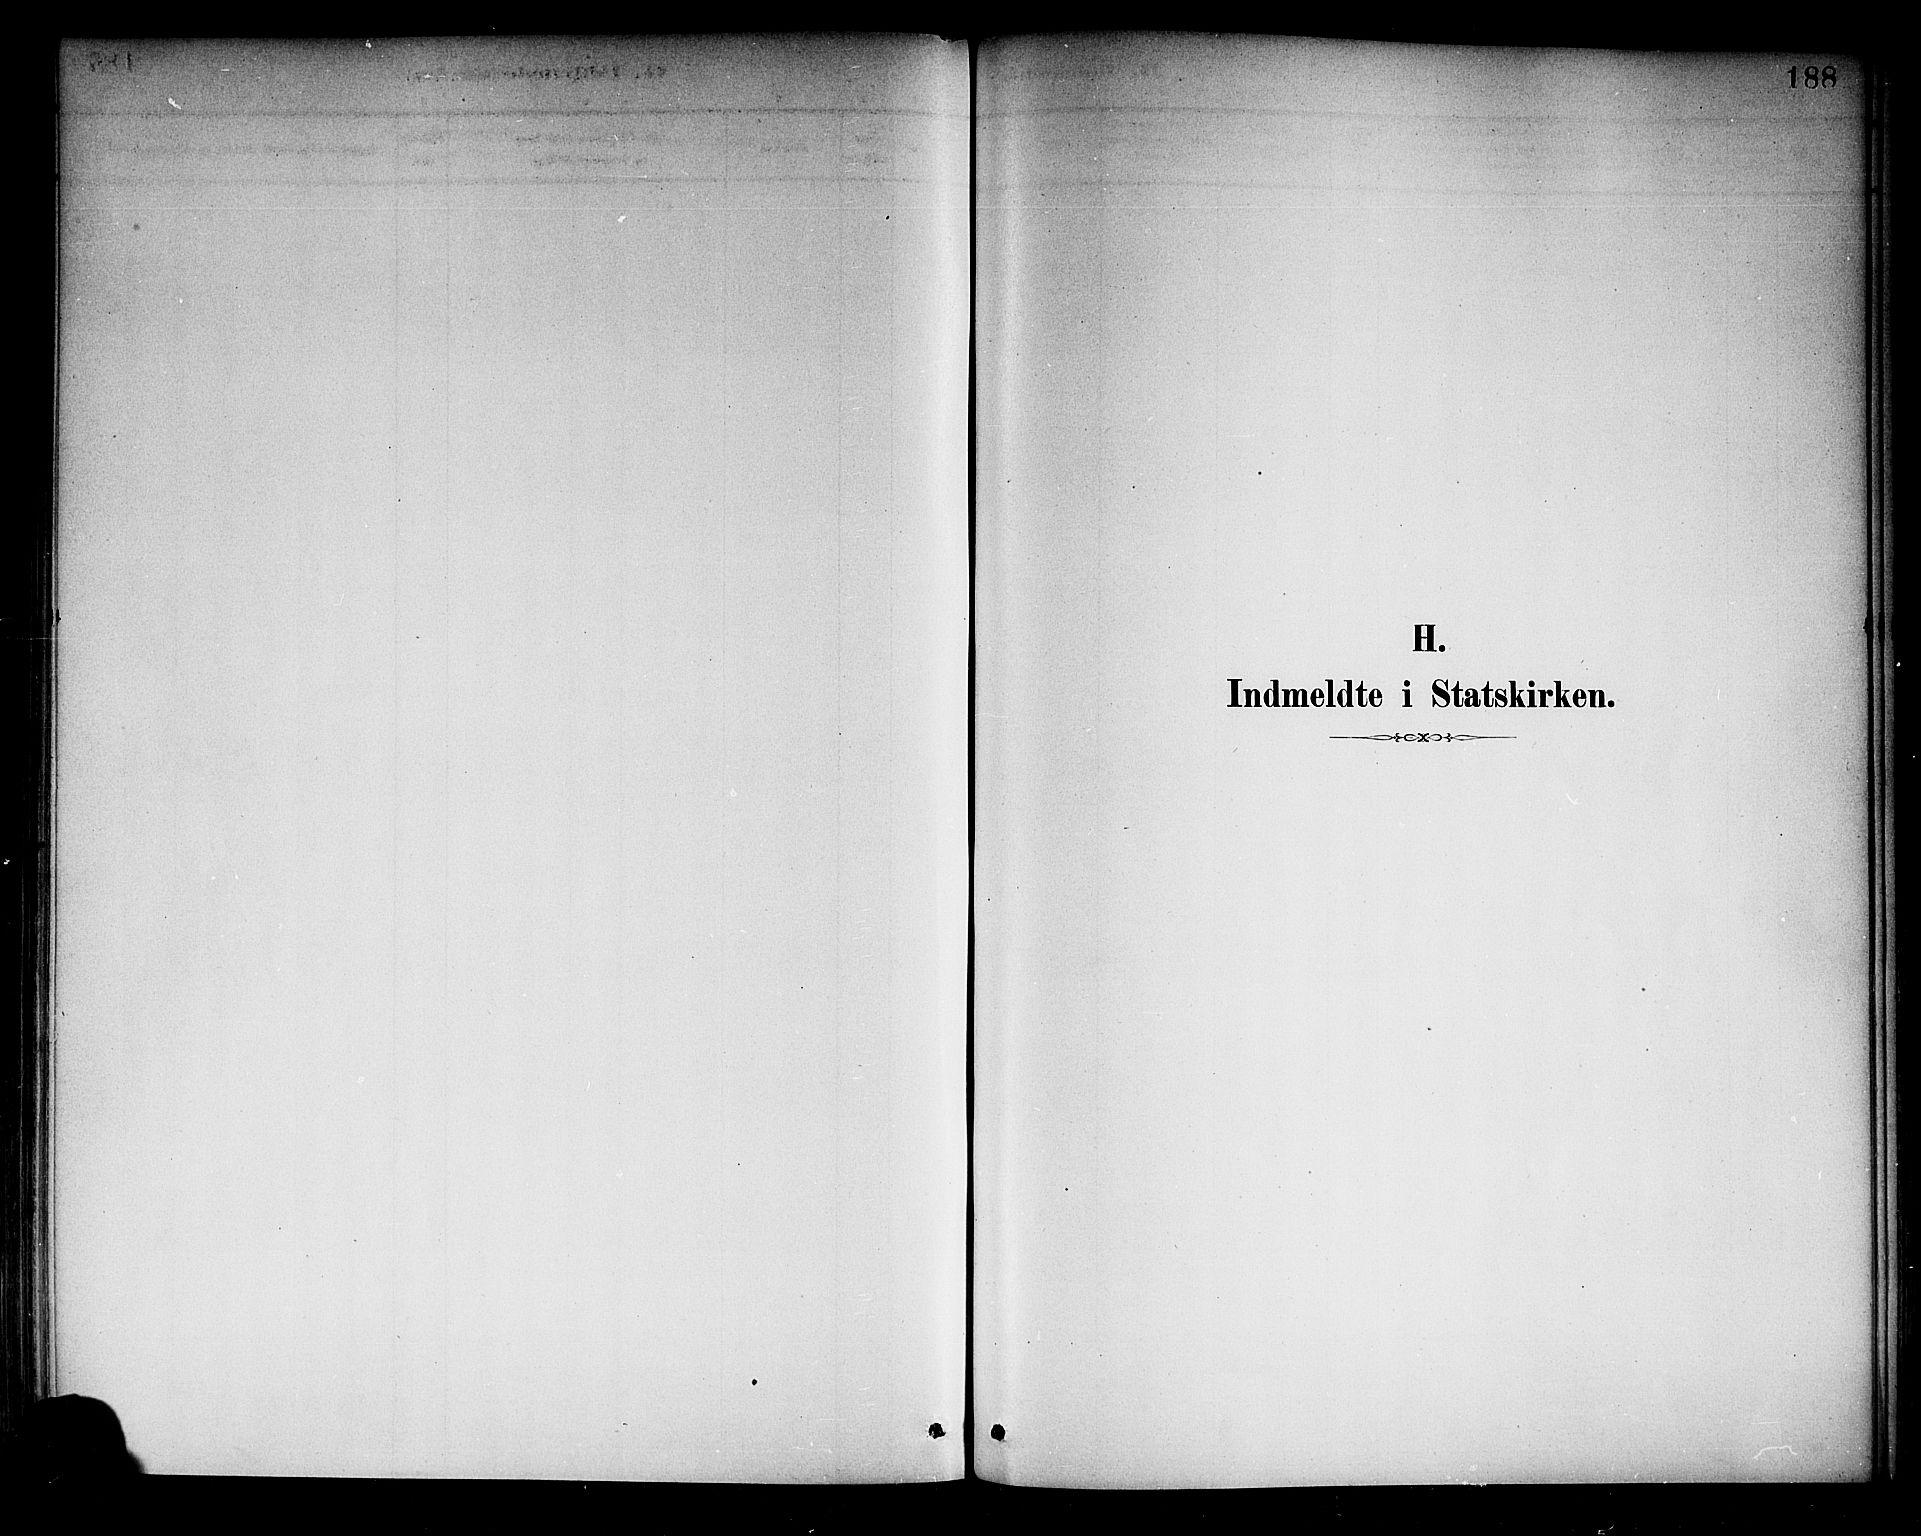 SAB, Selje sokneprestembete*, Ministerialbok nr. B 1, 1881-1890, s. 188